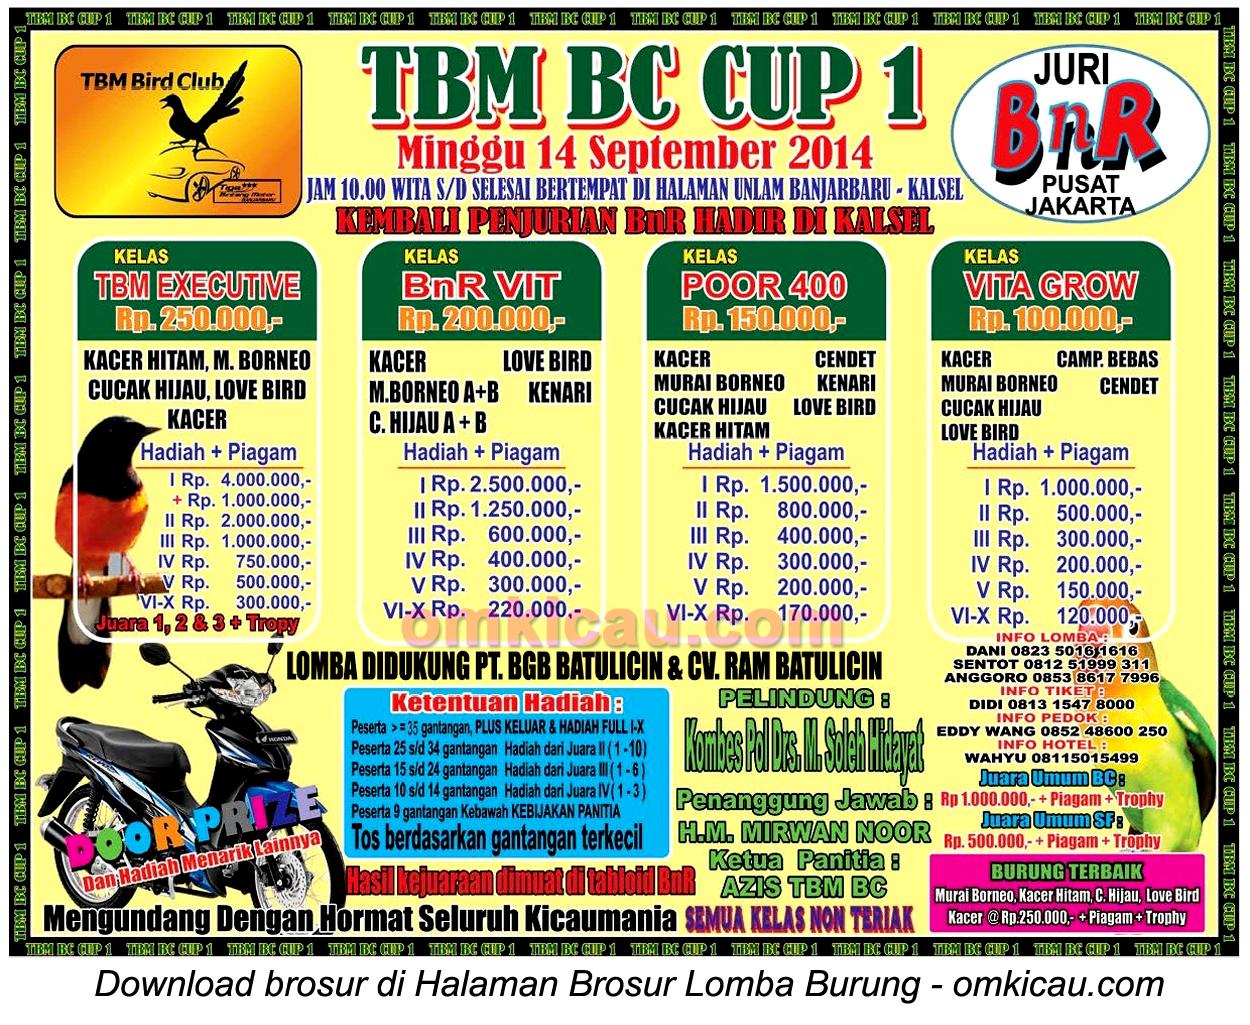 Brosur Lomba Burung Berkicau TBM BC Cup, Banjarbaru-Kalsel, 14 September 2014